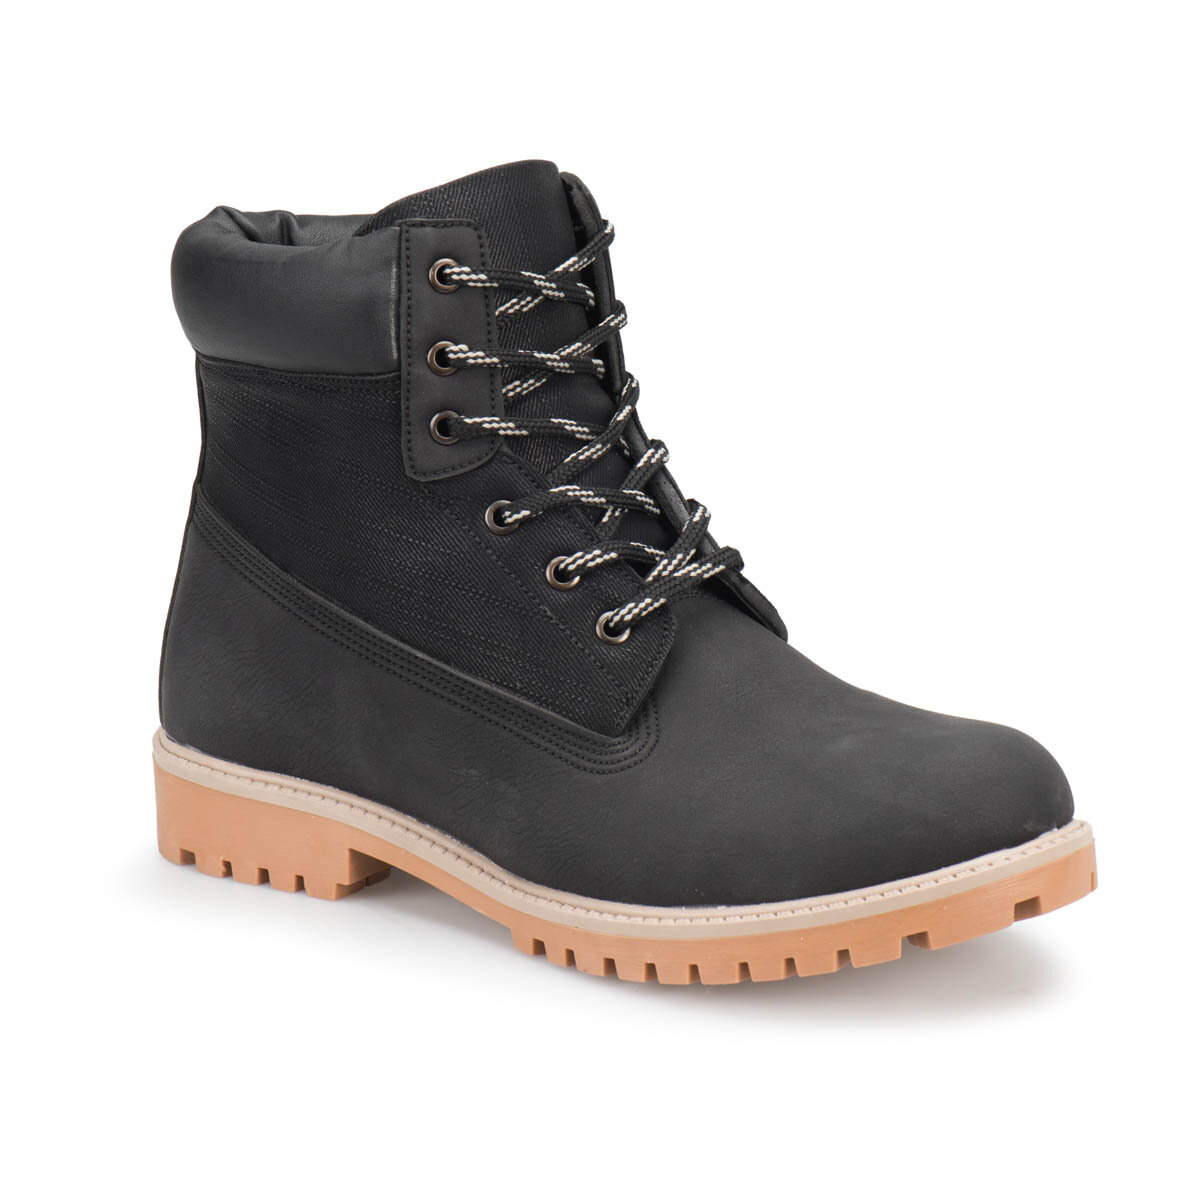 FLO ULB-10 Black Men Boots Panama Club